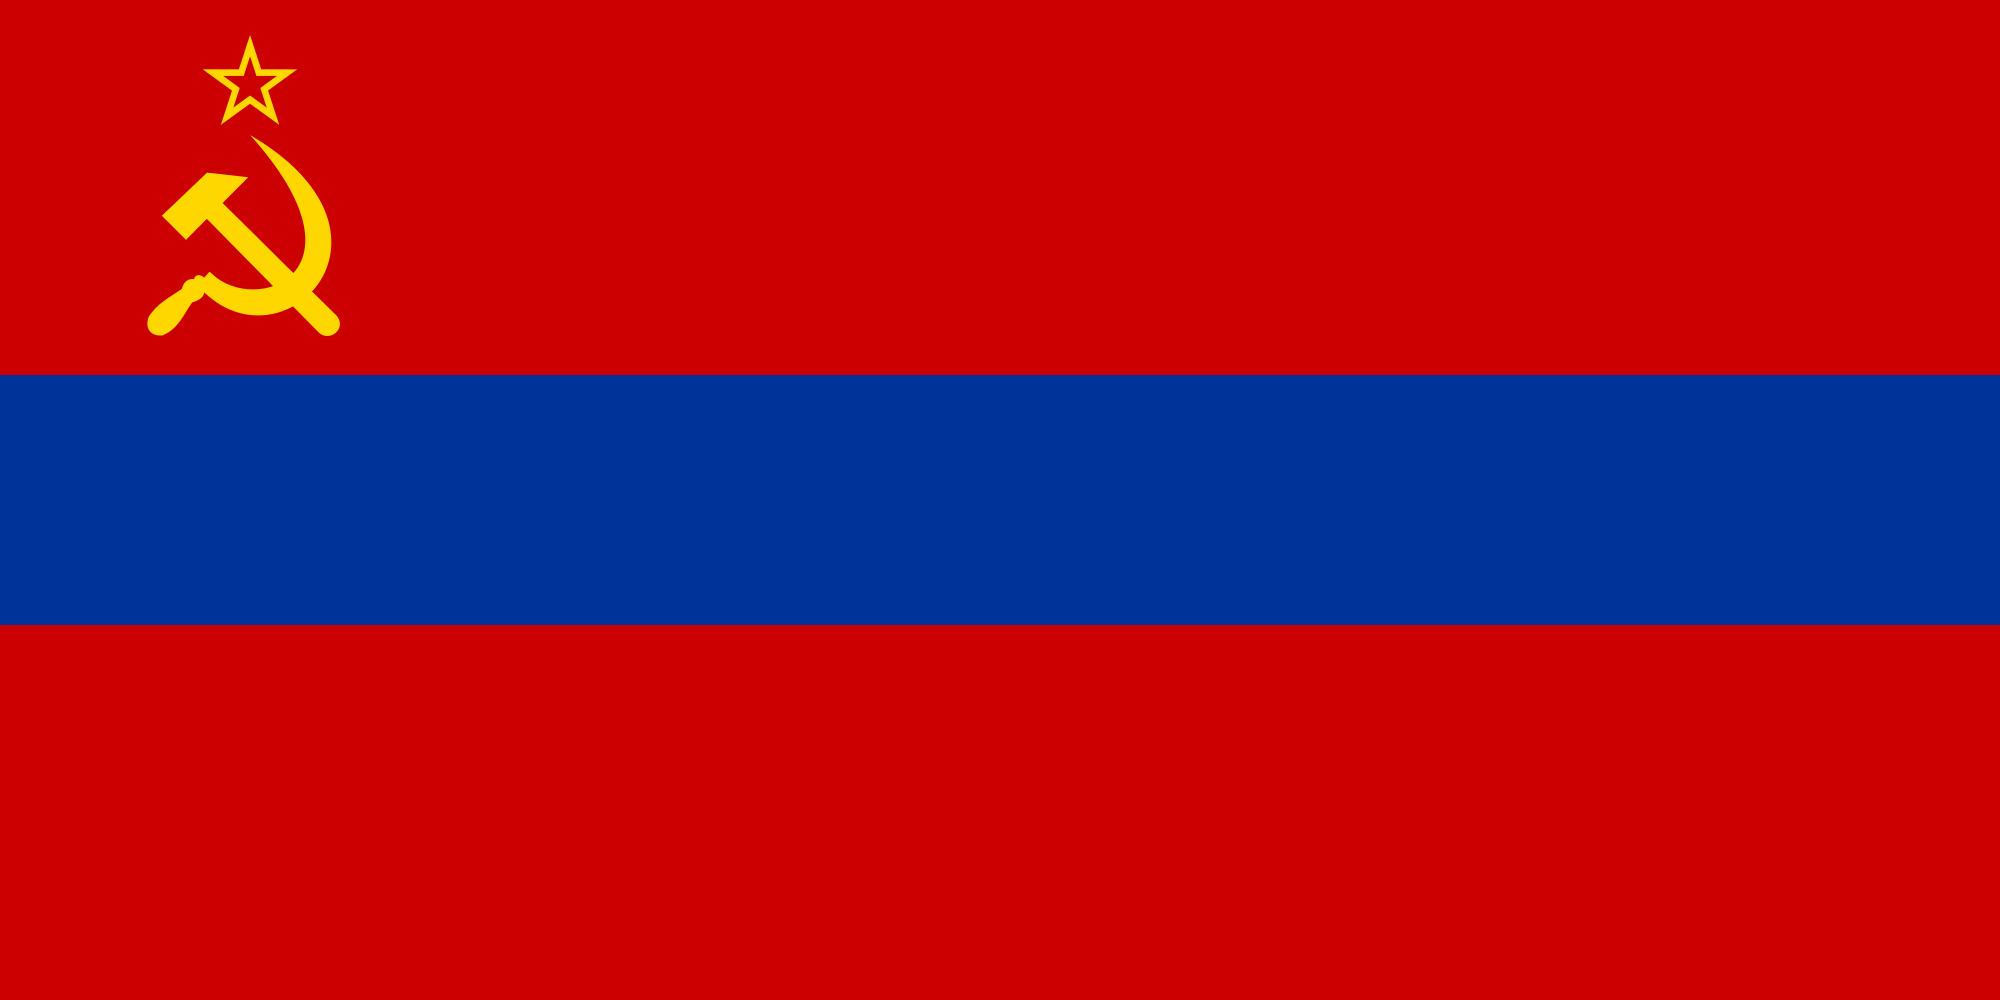 República Federal Socialista Soviética de Transcaucasia (MNI)